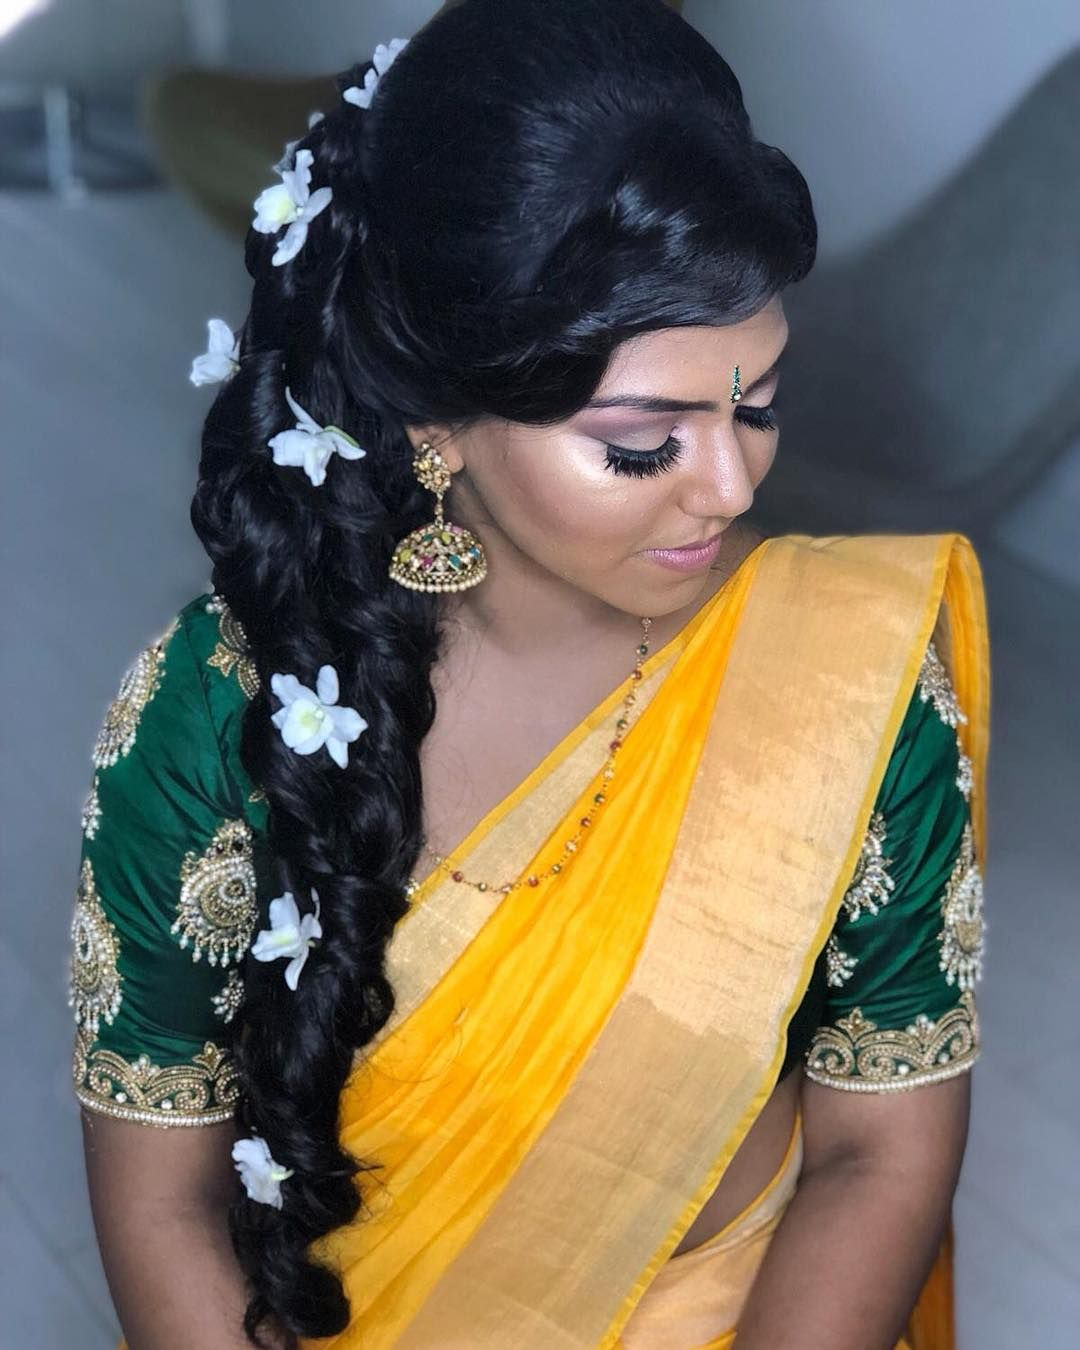 chaitra141